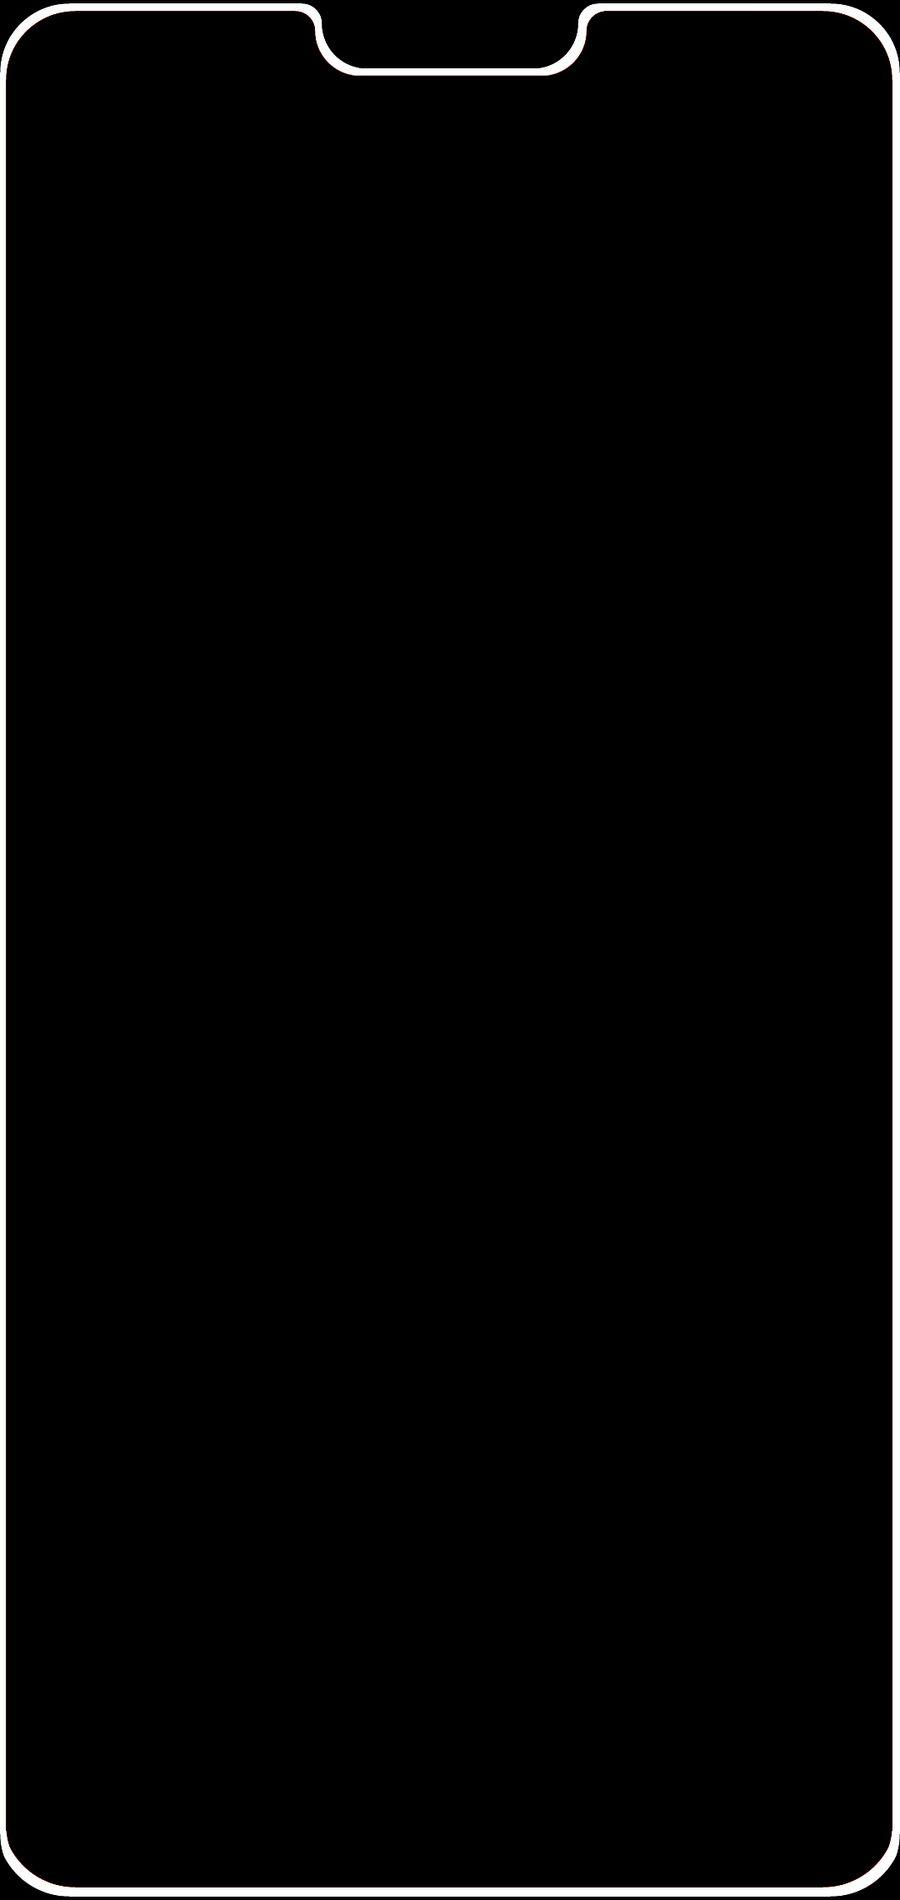 Обои на телефон свет, грани, галактика, белые, uhd, oneplus6, oneplus 6 white edge, oneplus 6, oneplus, one plus, hd, galaxy, 4k